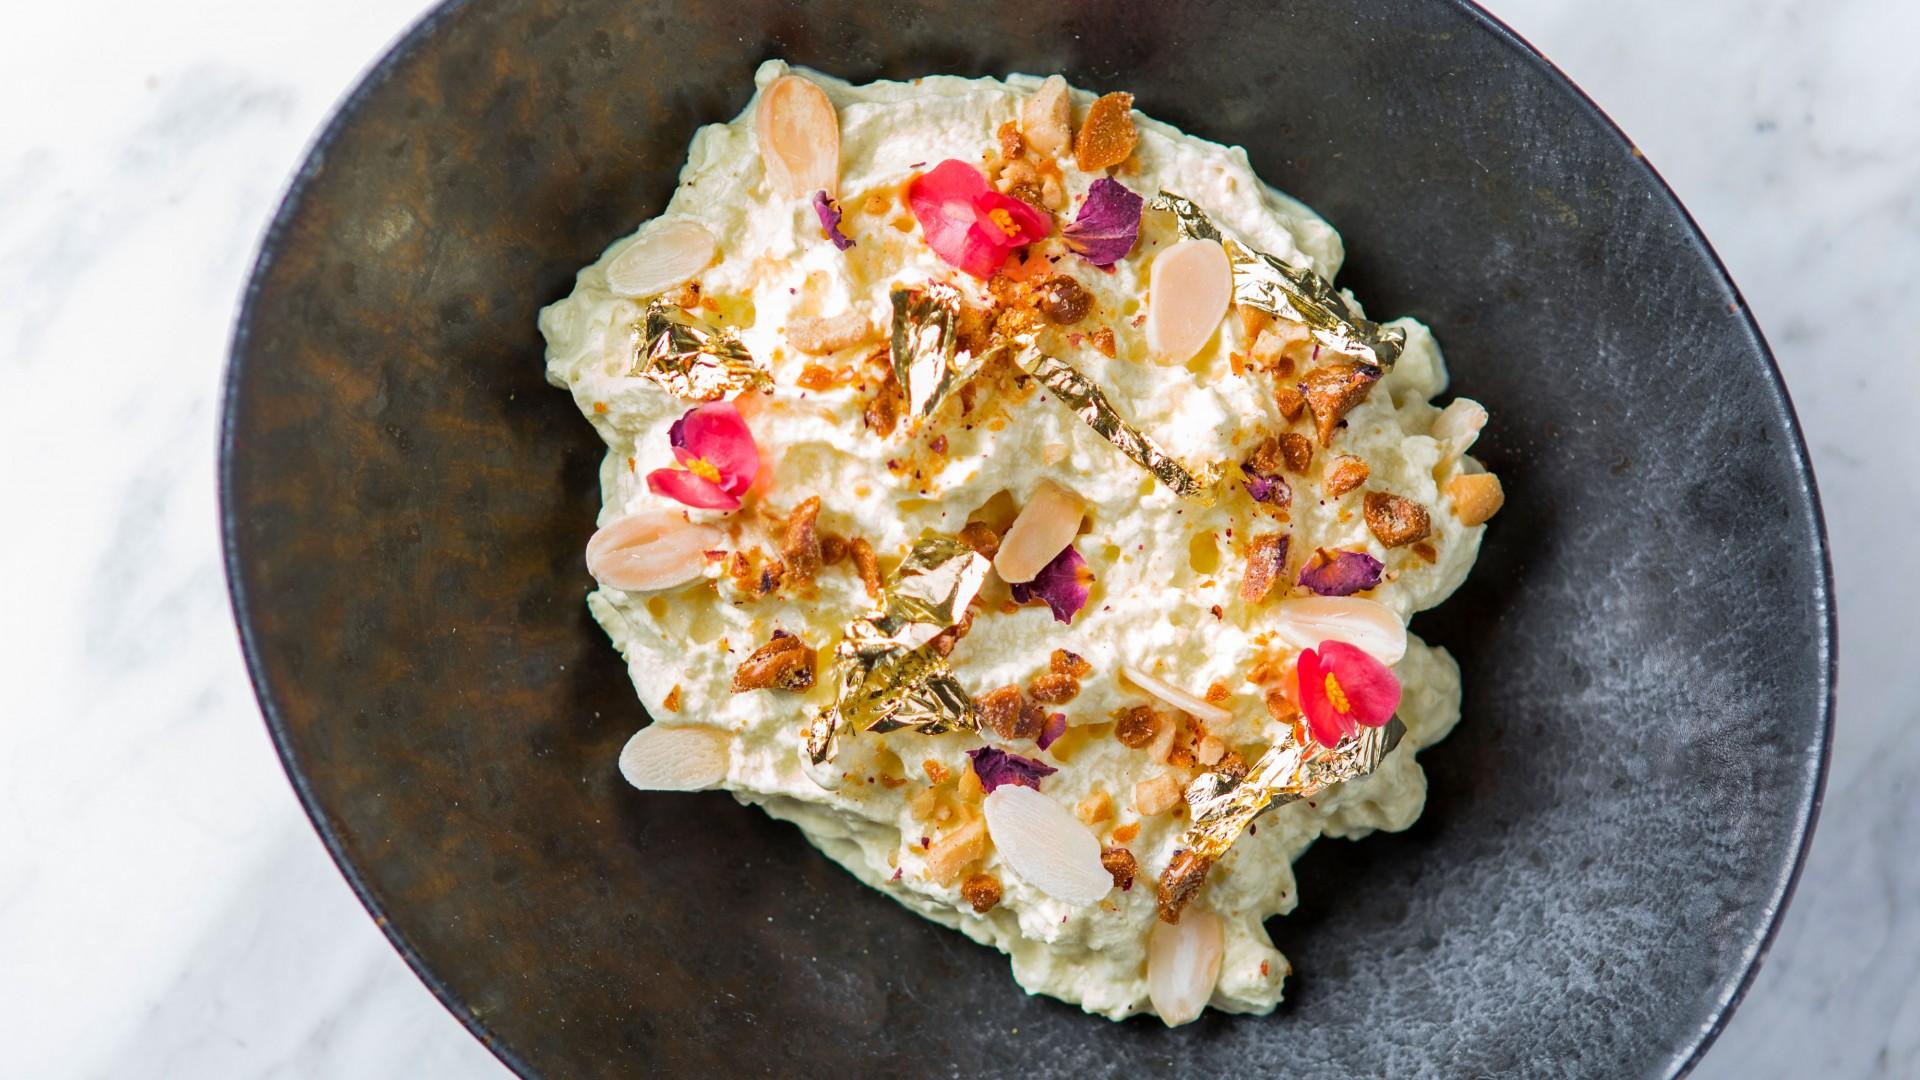 Makhan malai, saffron milk, rose petal jaggery brittle, almonds